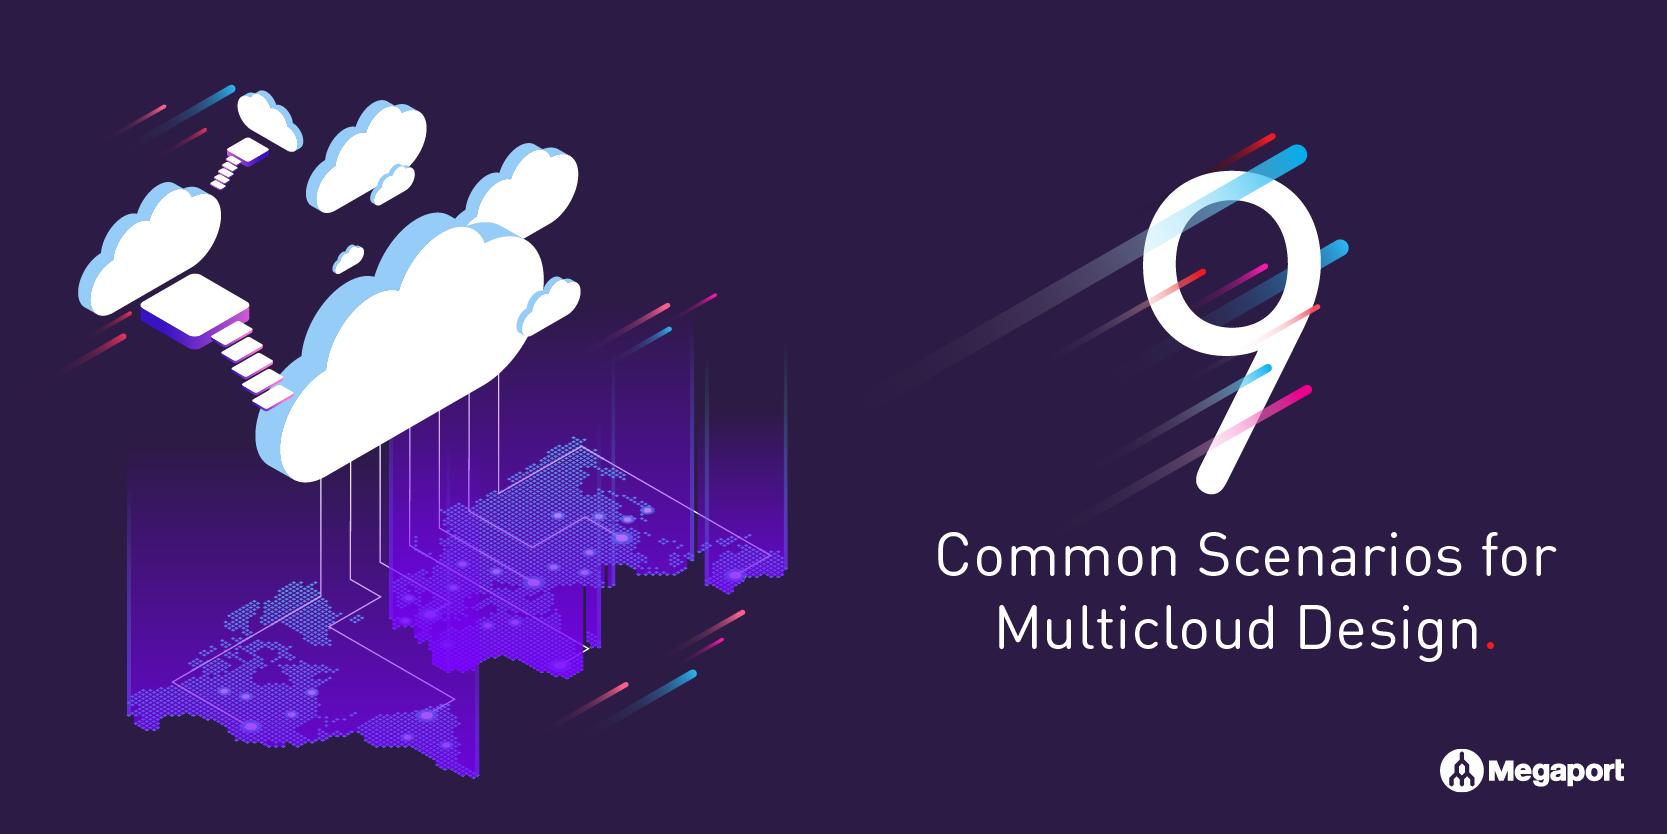 Nine Common Multicloud Scenarios